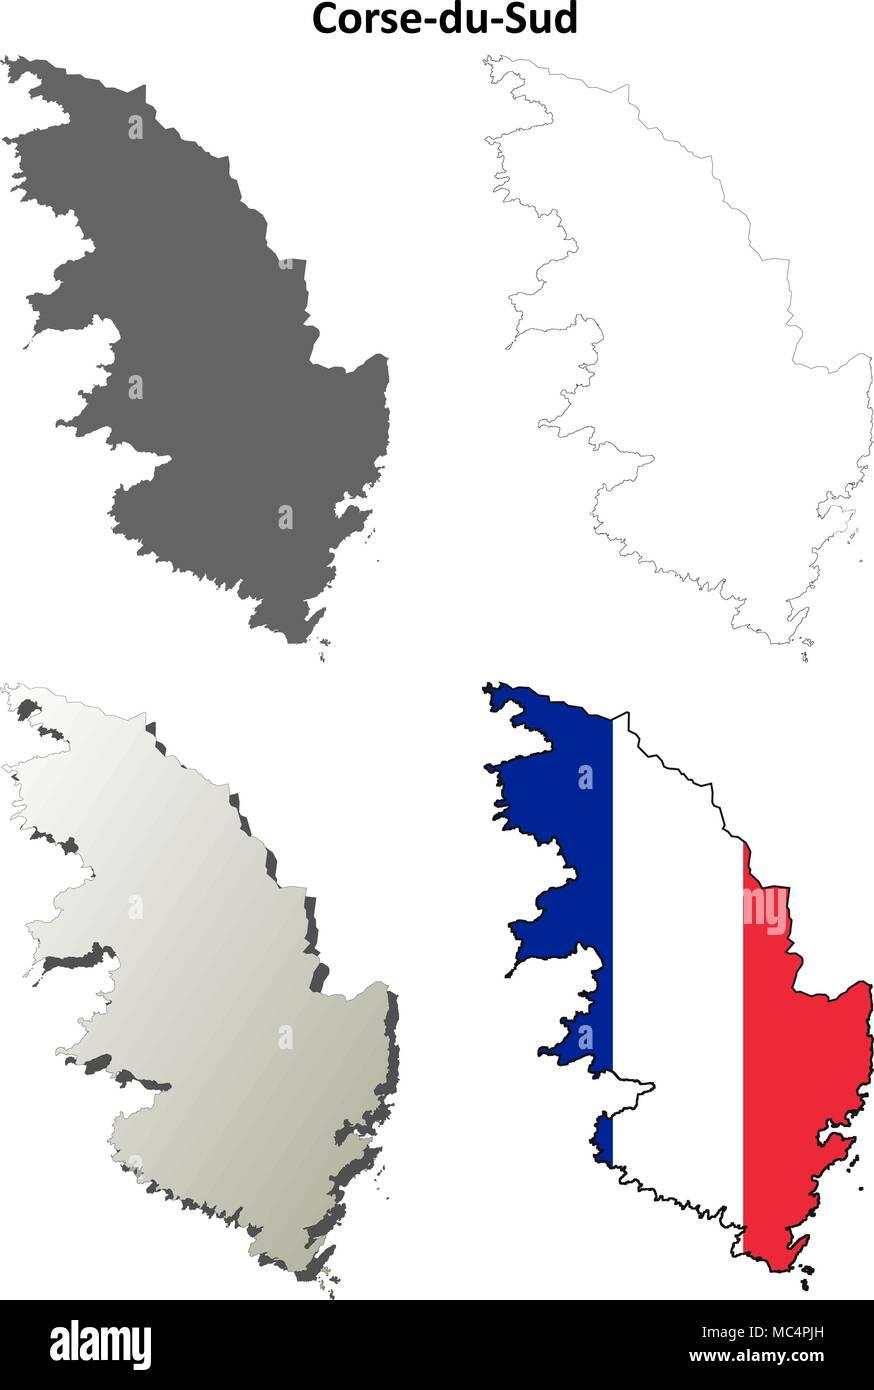 Corsica Map Stockfotos & Corsica Map Bilder - Seite 3 - Alamy